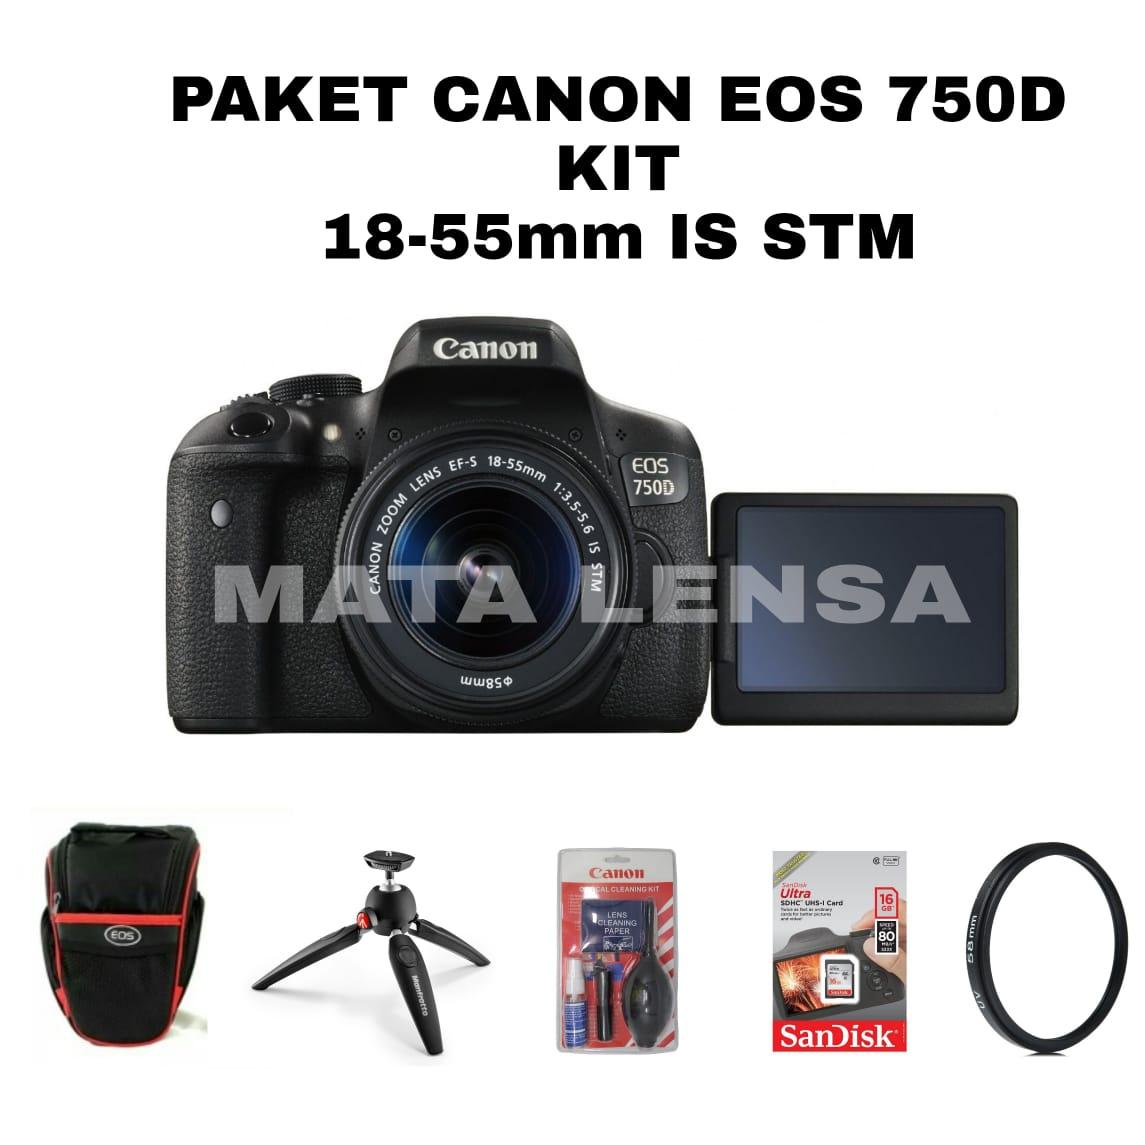 PROMO Paket Kamera / Camera Canon EOS 750D Kit (EF-S18-55mm IS STM) Original Bergaransi